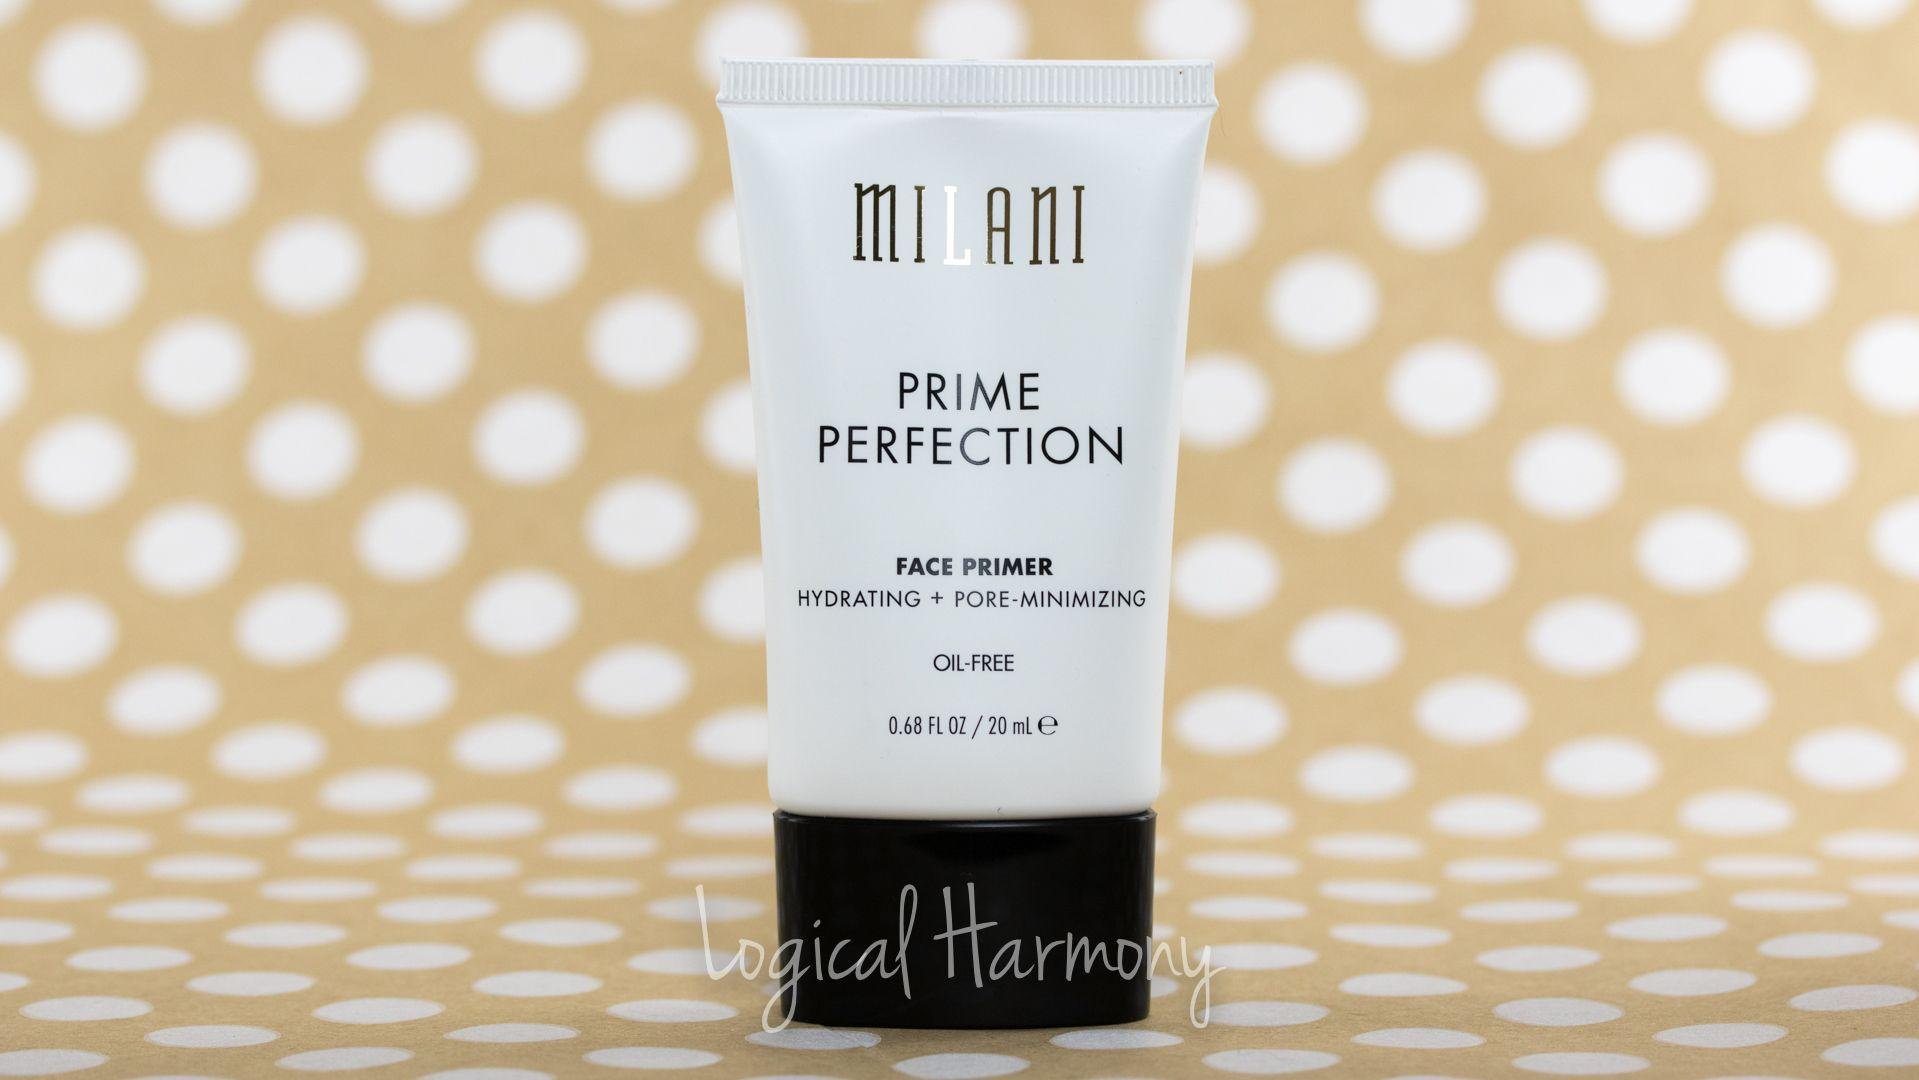 Milani Prime Perfection Hydrating + PoreMinimizing Face